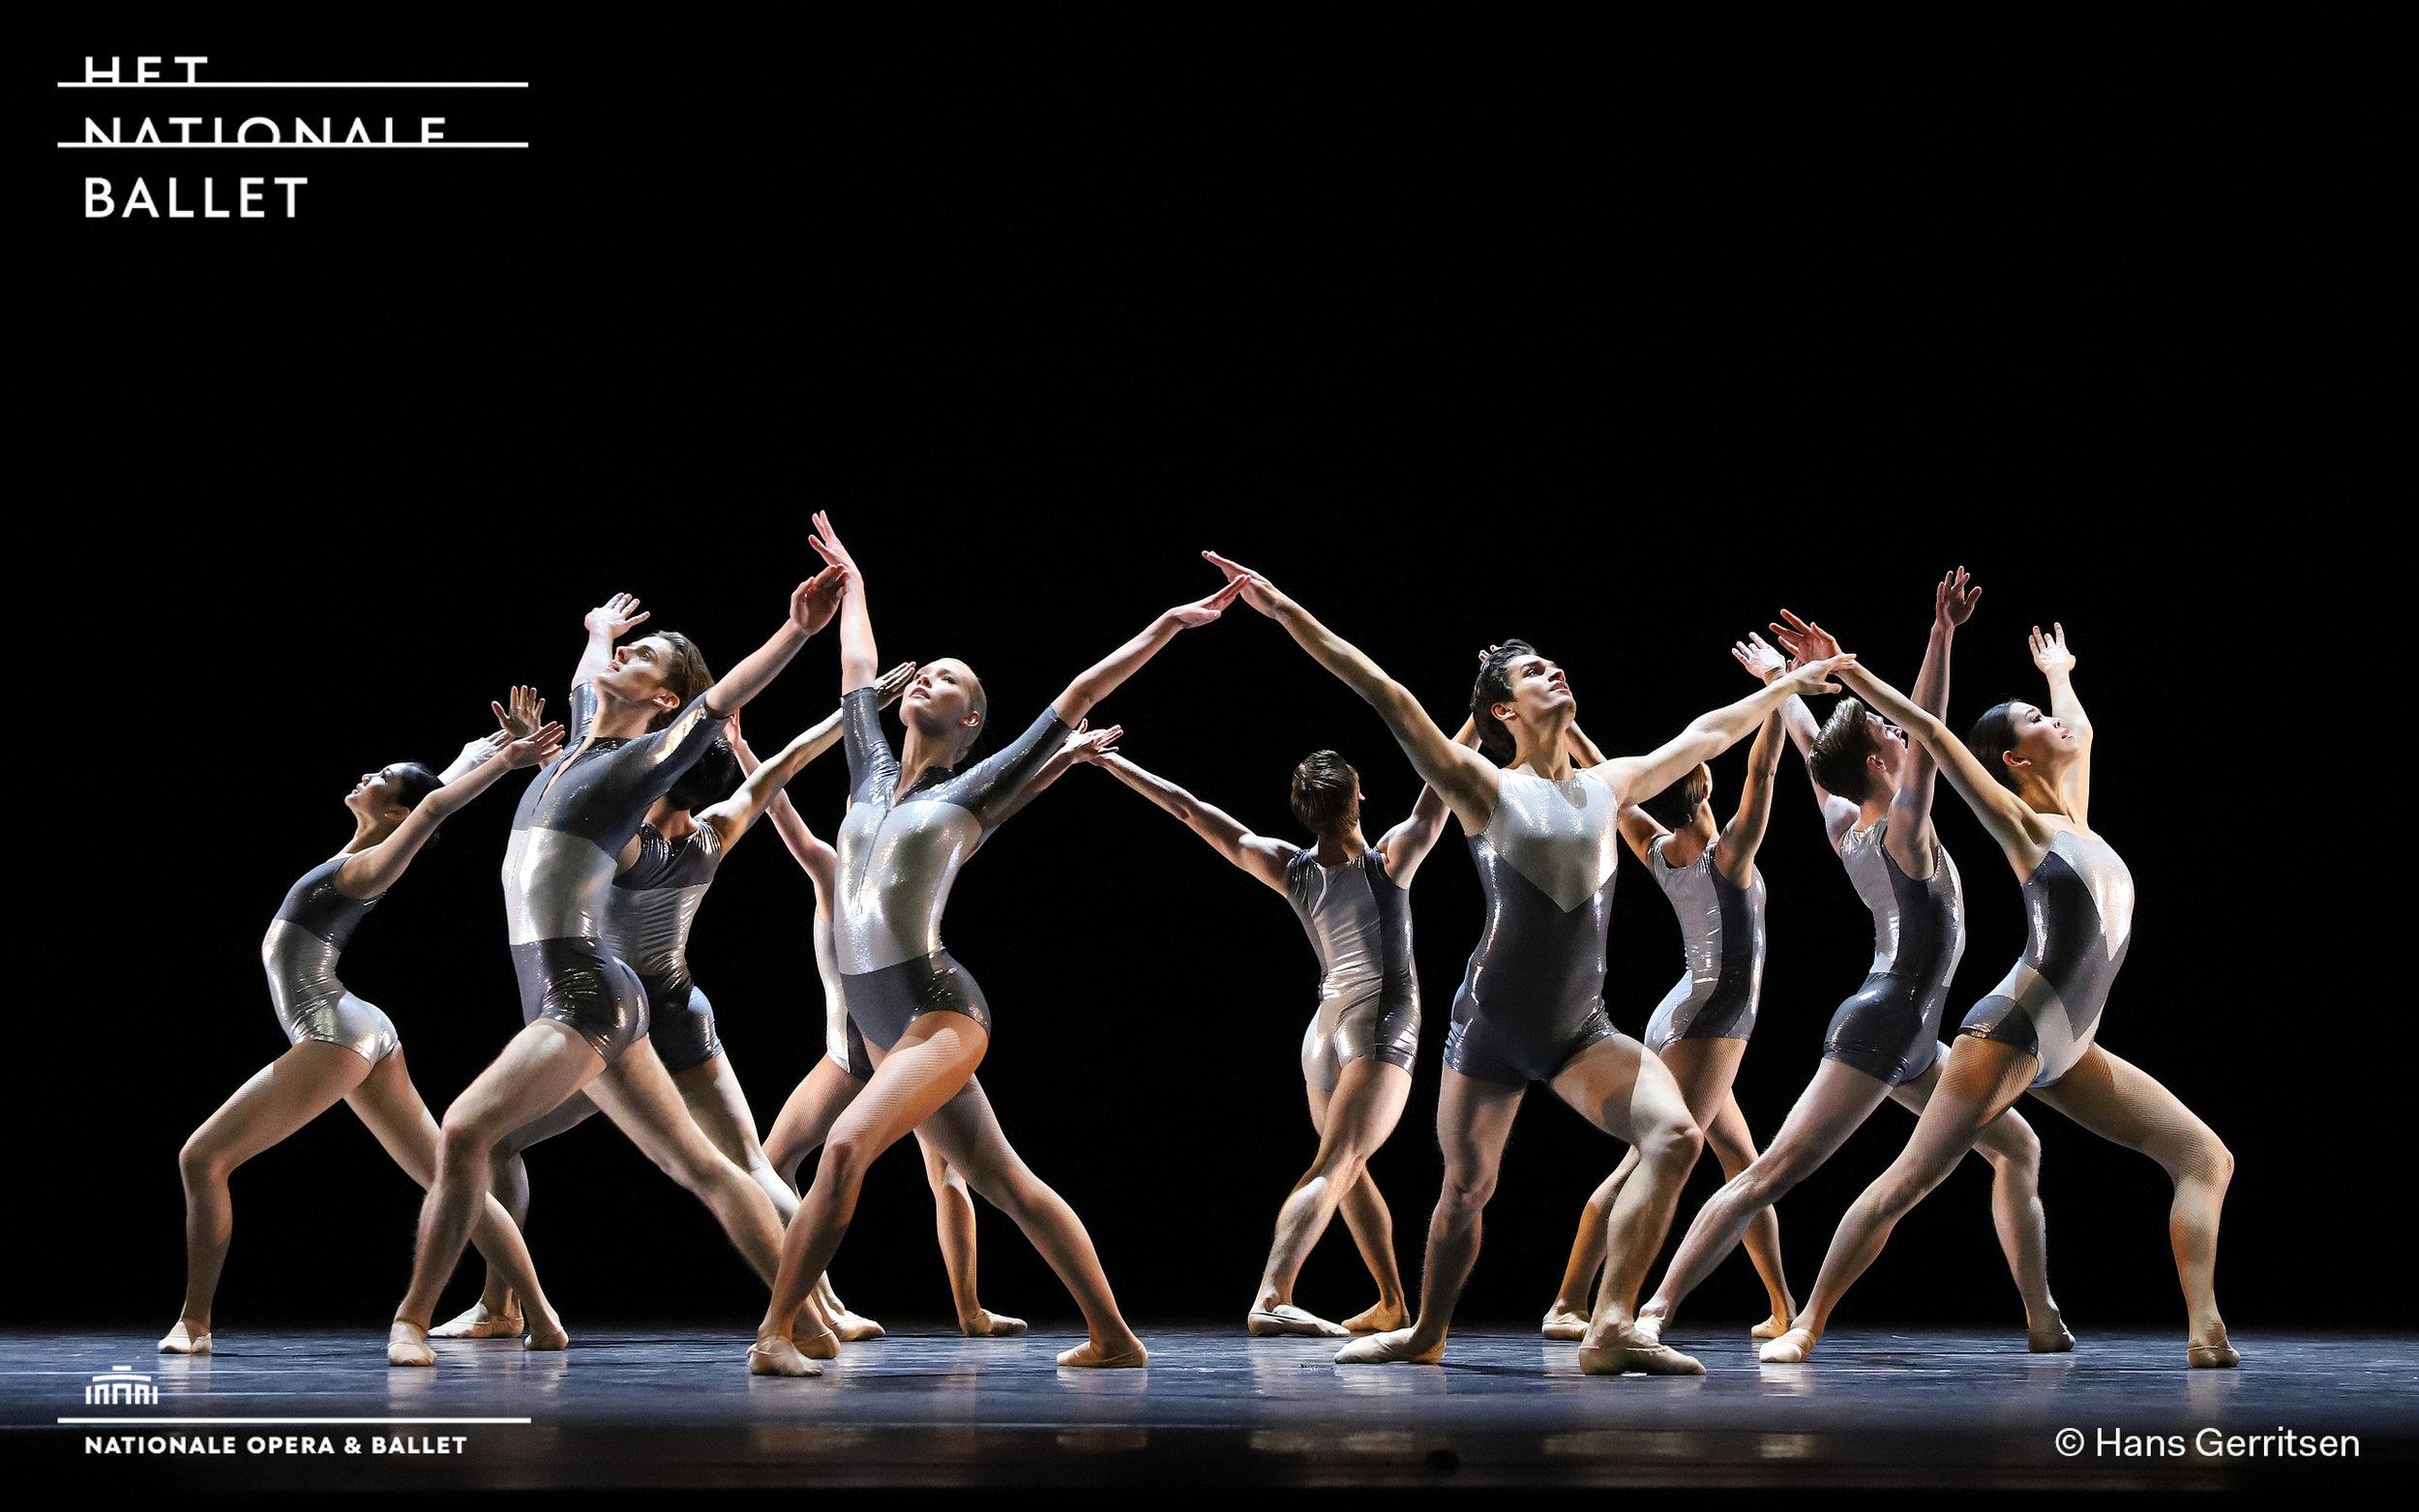 Photo Credits:  MESMER - for Dutch National Ballet Junior Company  Choreography: Wubkje Kuindersma  Photographer: Hans Gerritsen  Dancers: Dutch National Ballet Junior Company